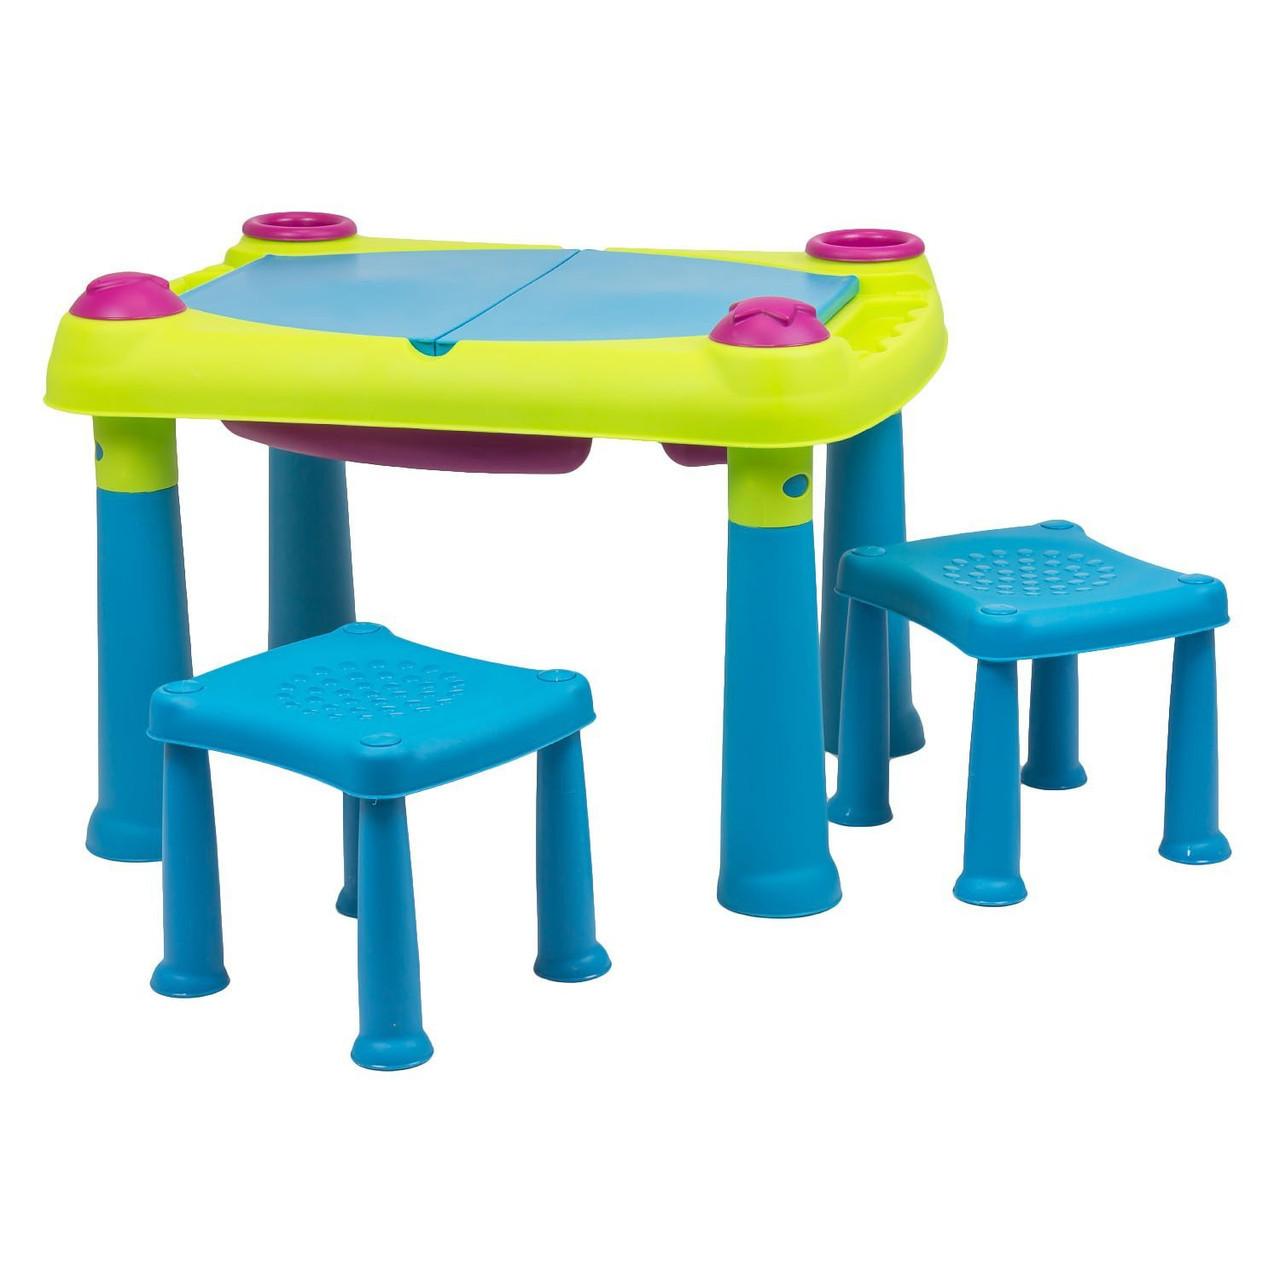 Игровой столик Keter Kids Creative Play, фото 1